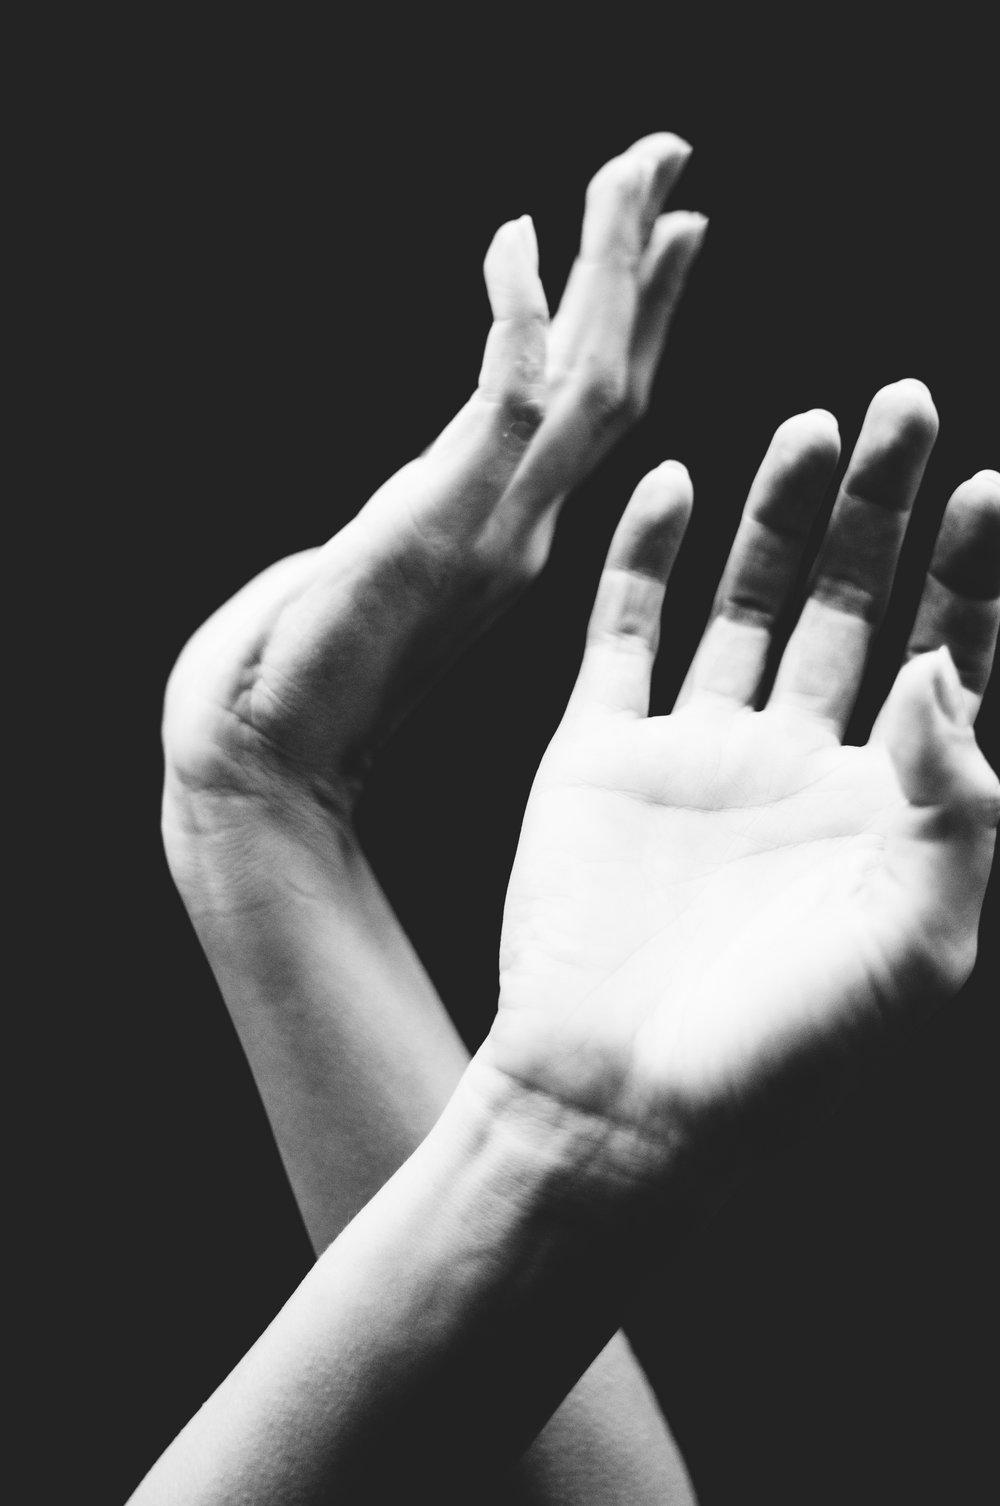 hands5bw.jpg